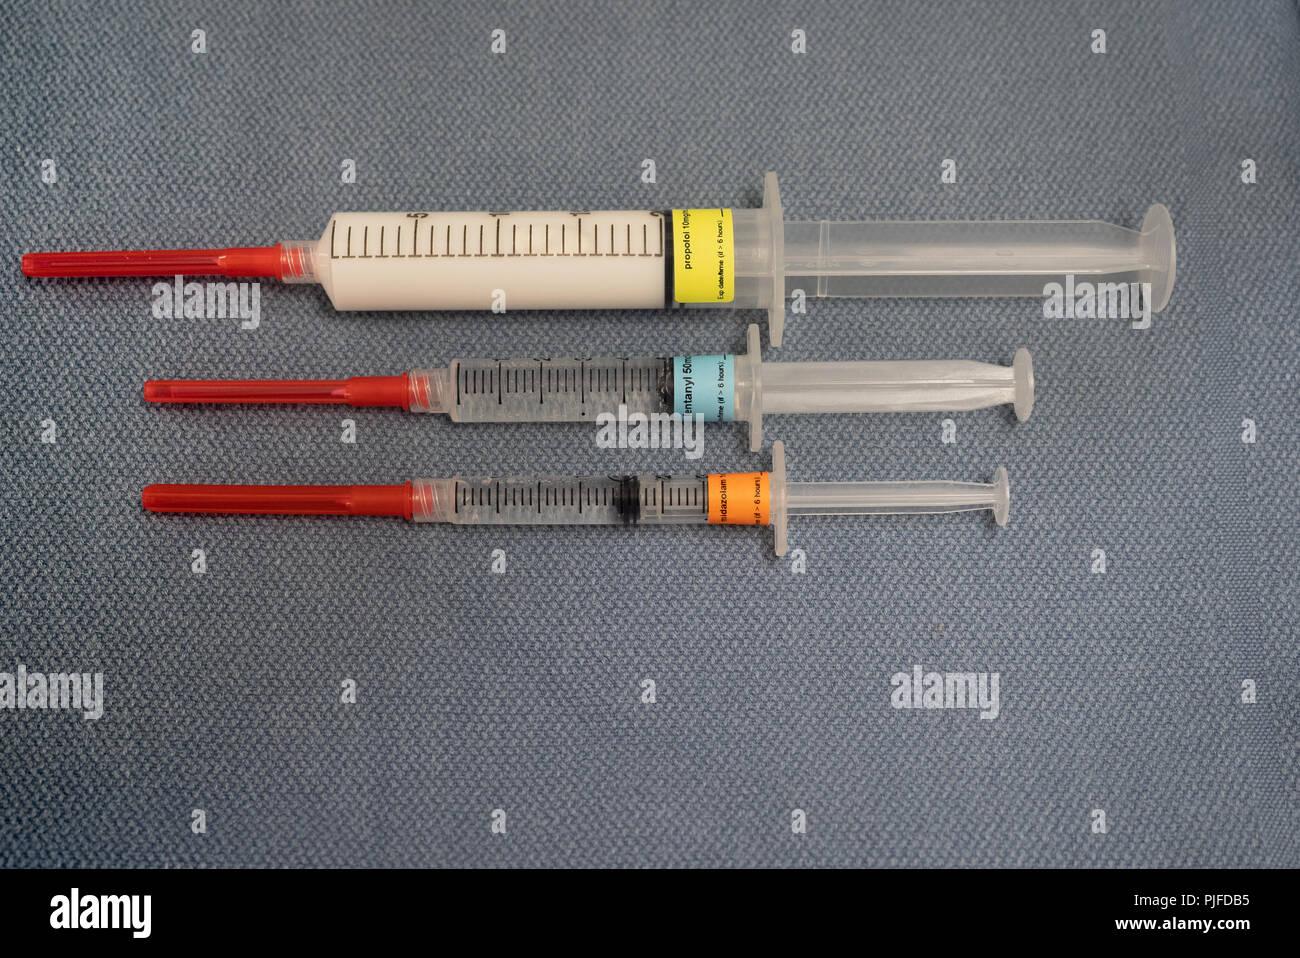 Anesthetics Stock Photos & Anesthetics Stock Images - Alamy